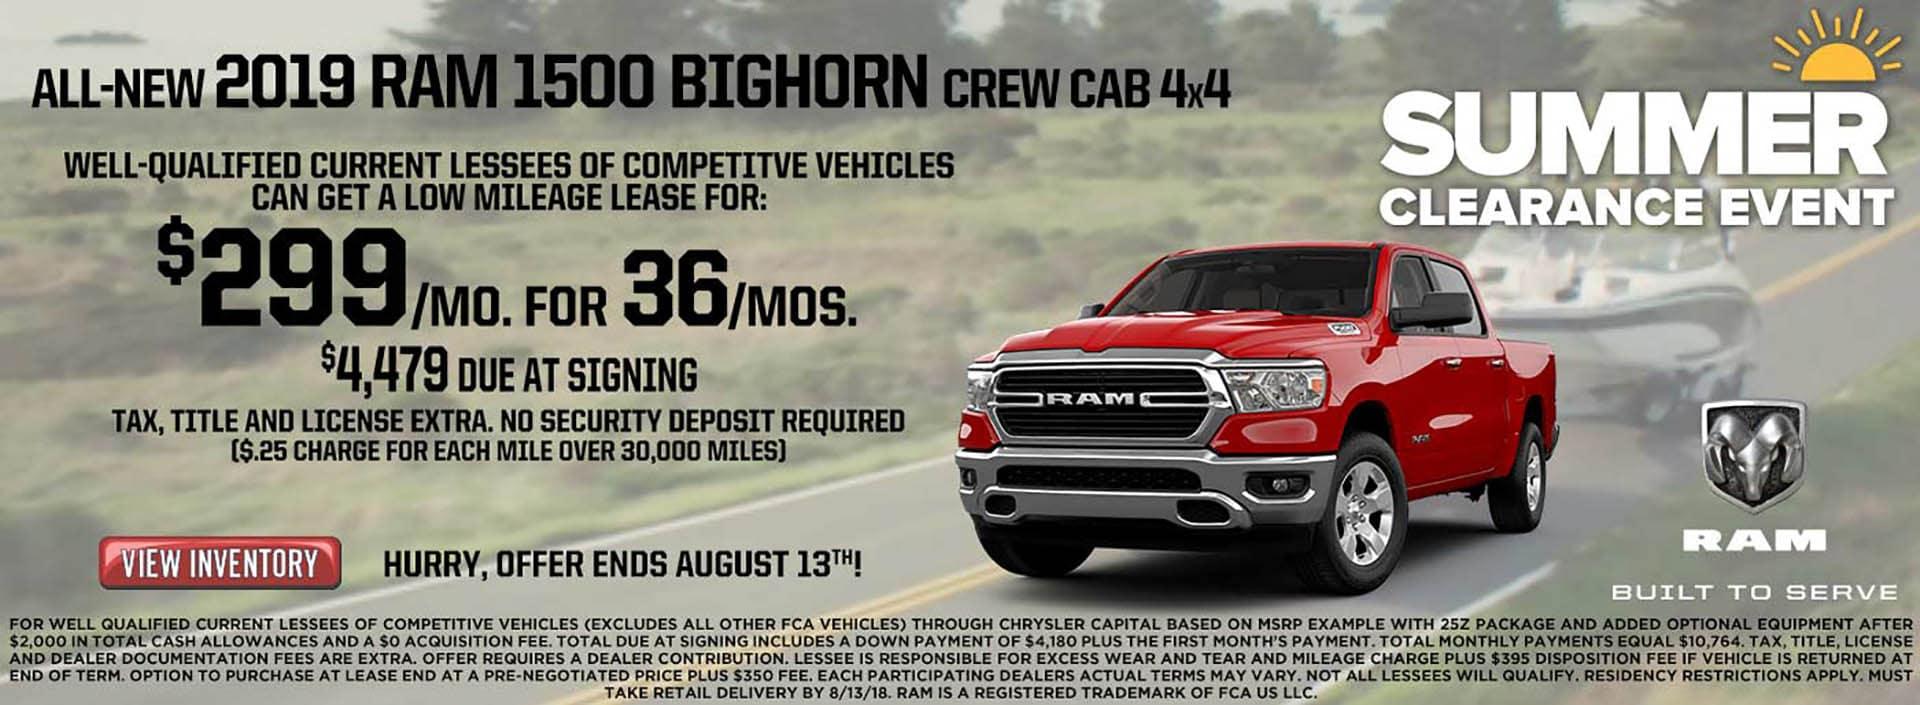 2019 Bighorn $299 Lease